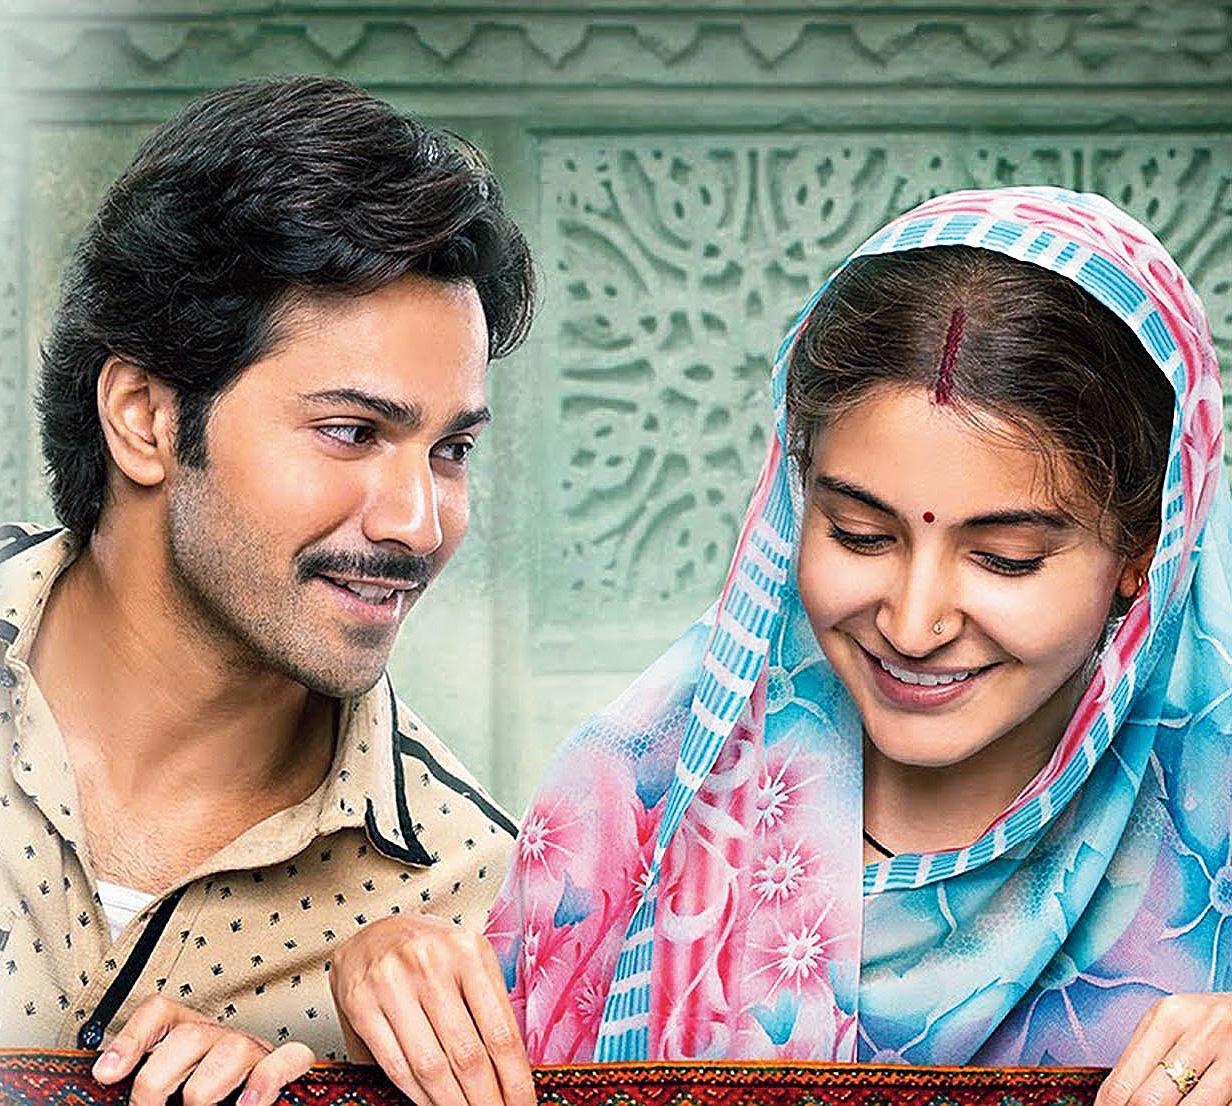 Varun Dhawan and Anushka Sharma in a still from the film.